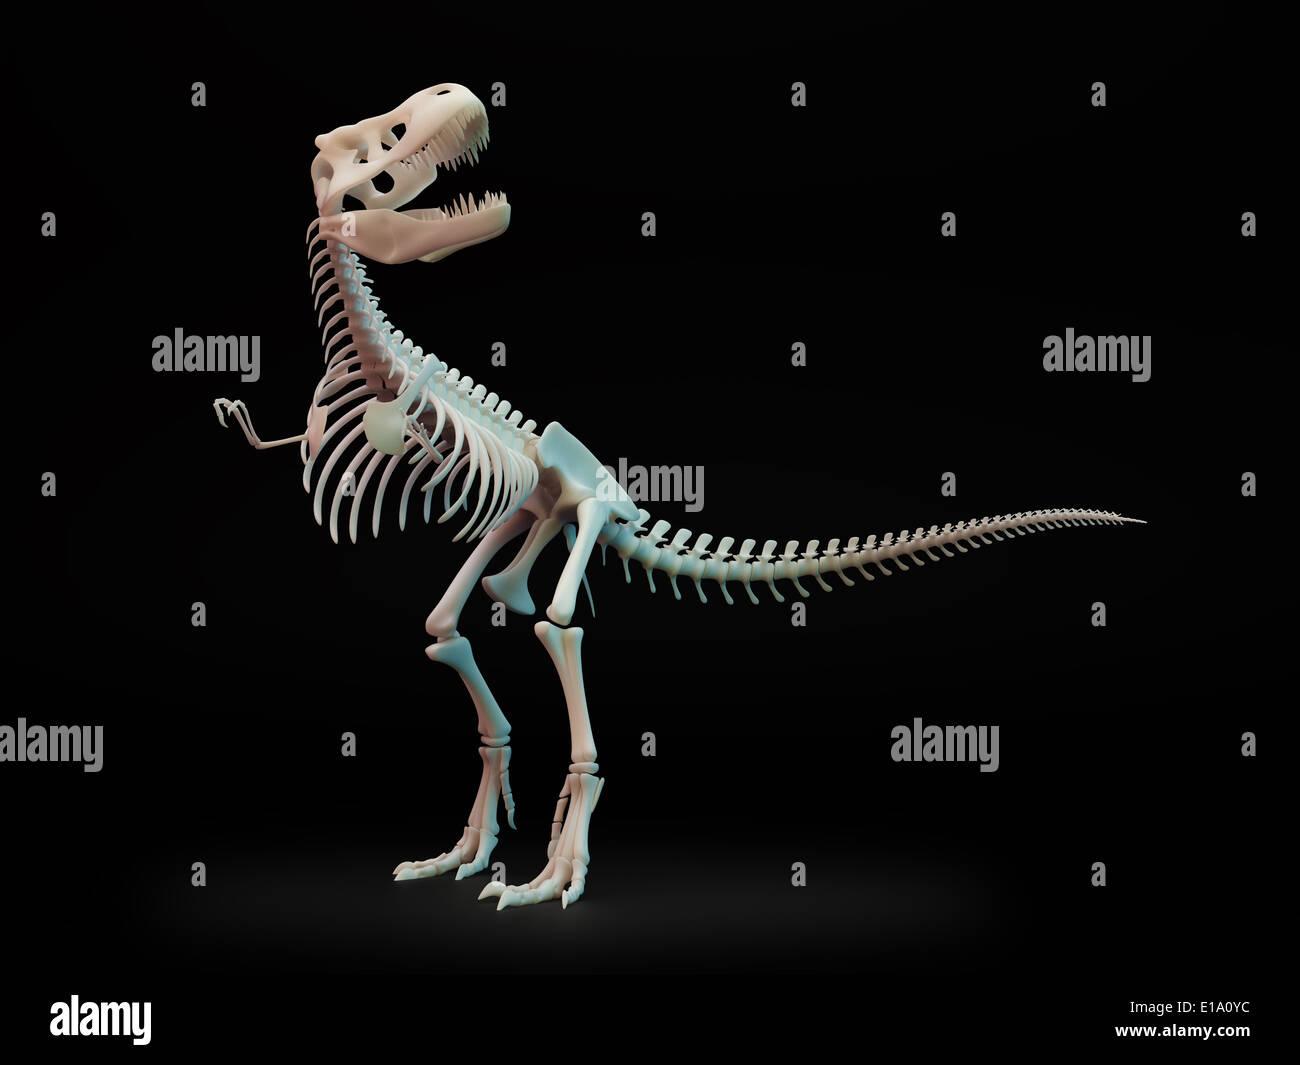 Tyrannosaurus rex, large carnivorous dinosaur, skeleton. - Stock Image